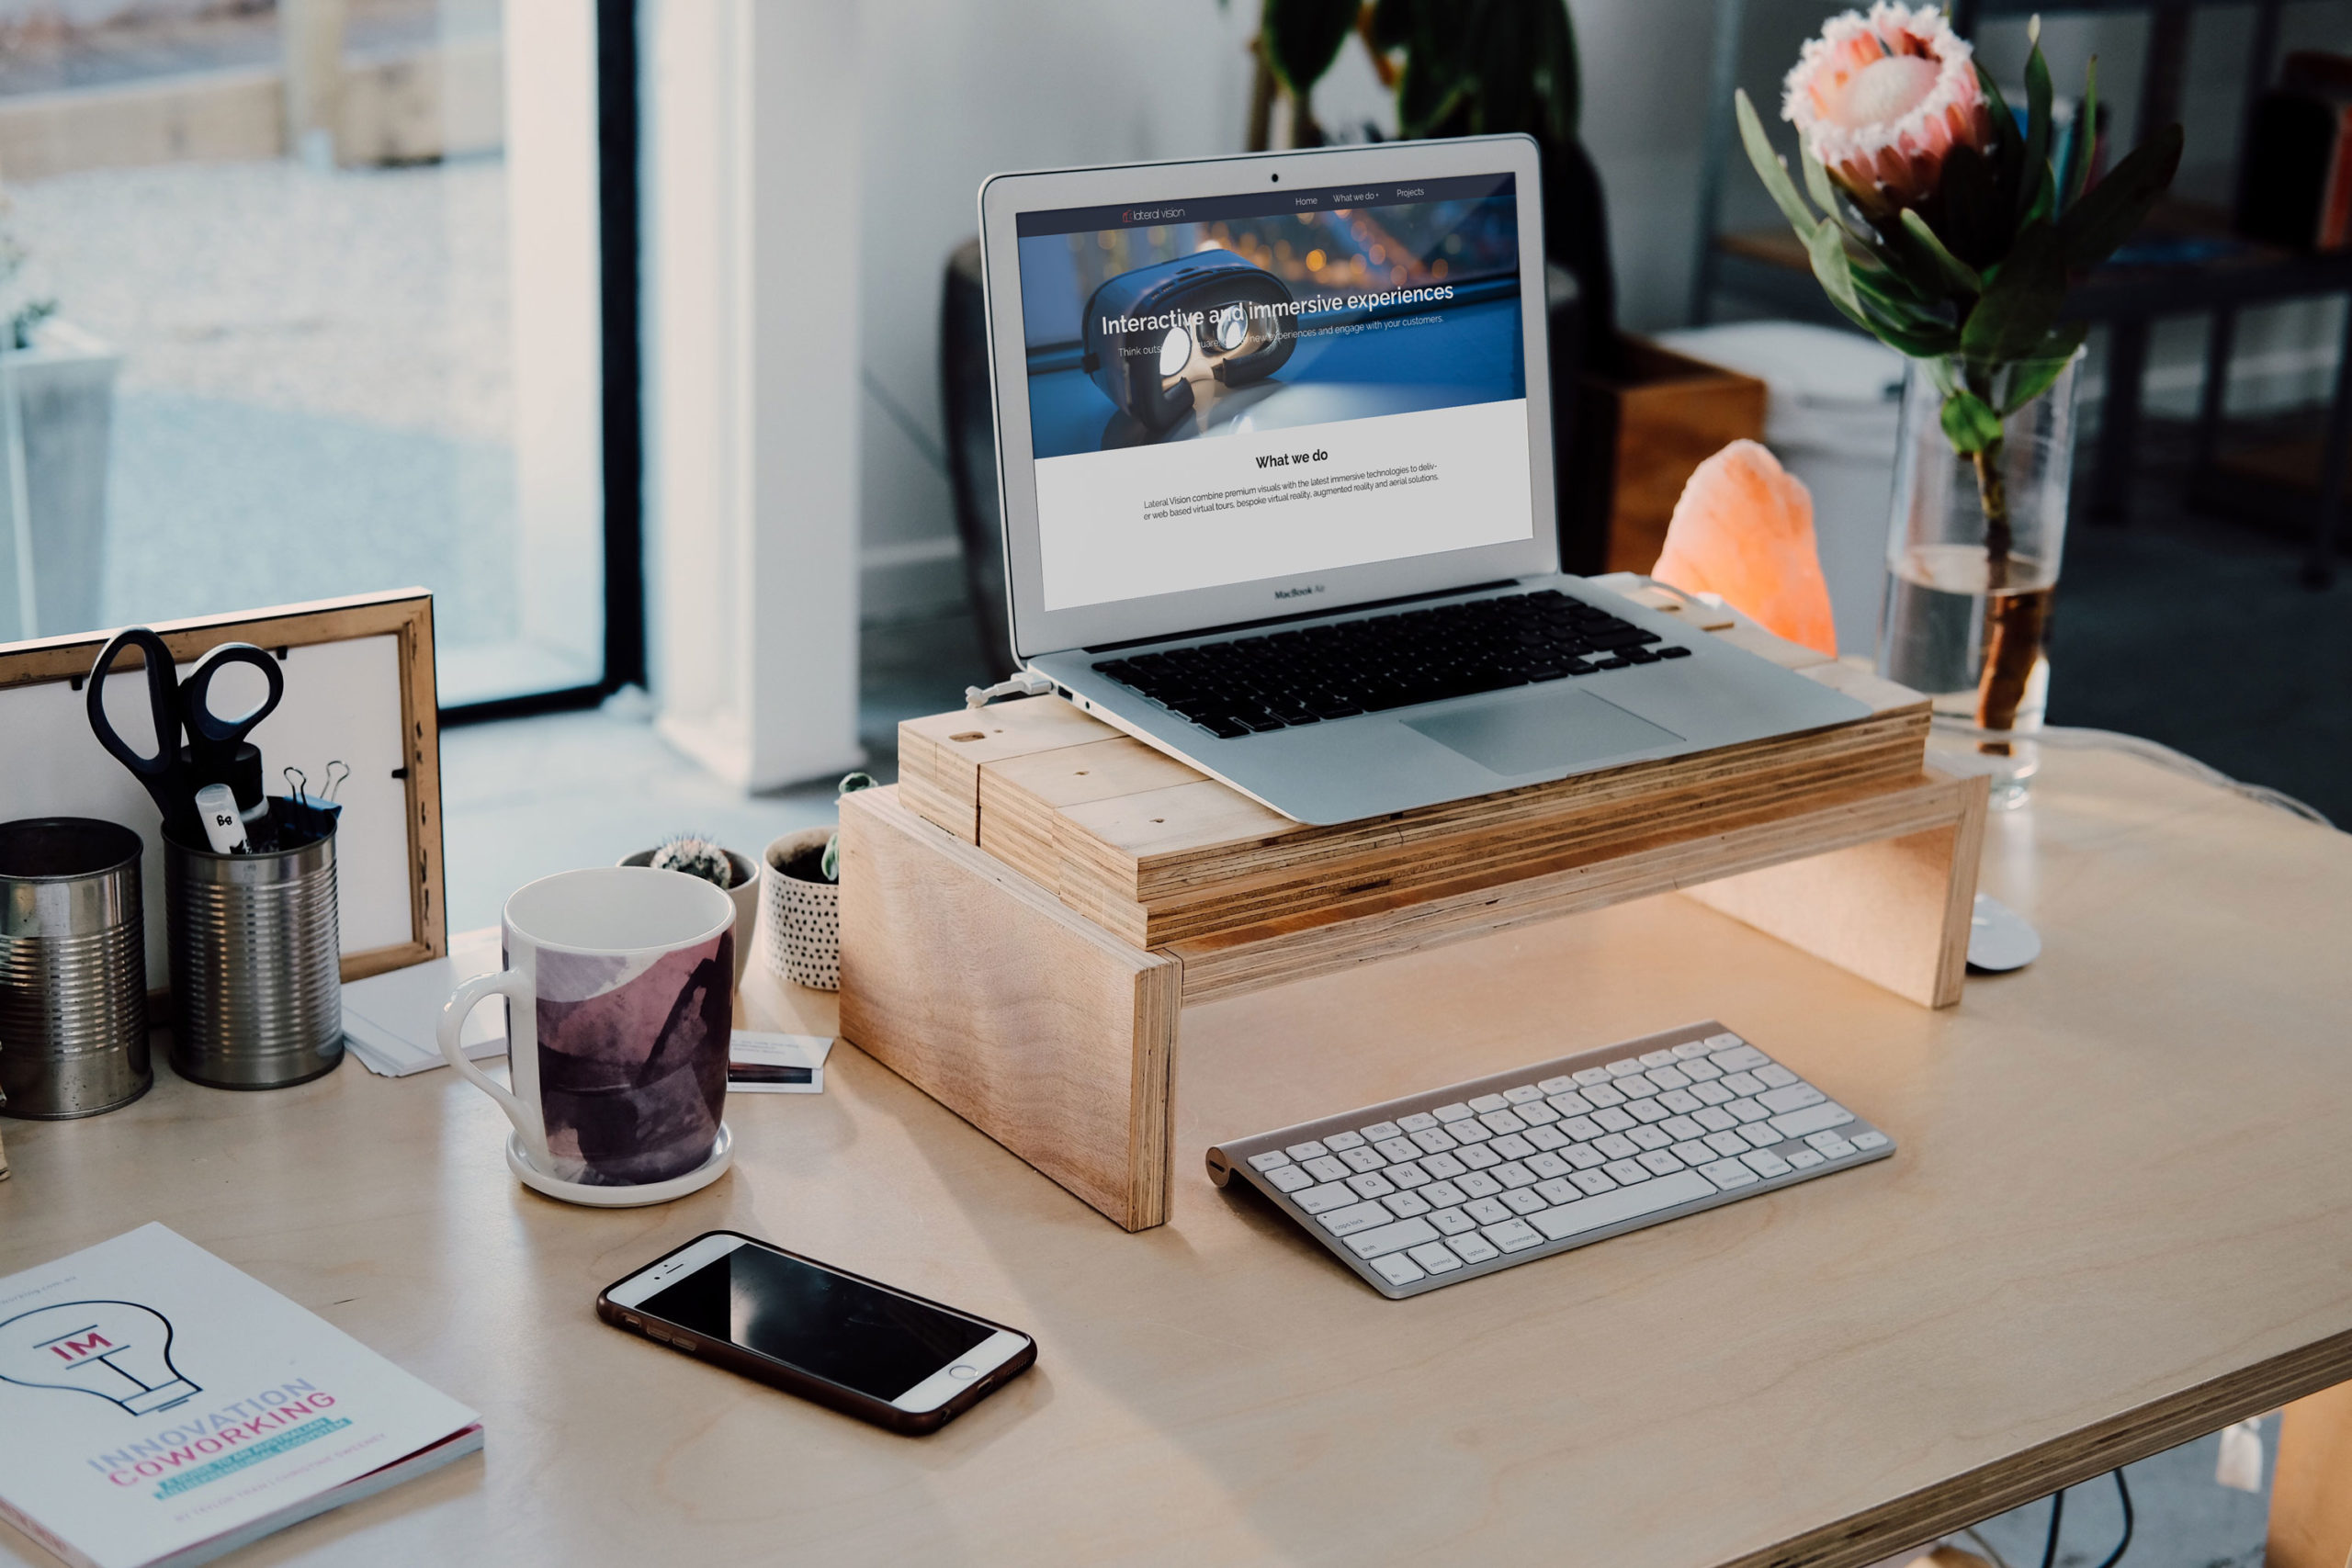 Desktop scene showing Lateral Vision website on a laptop